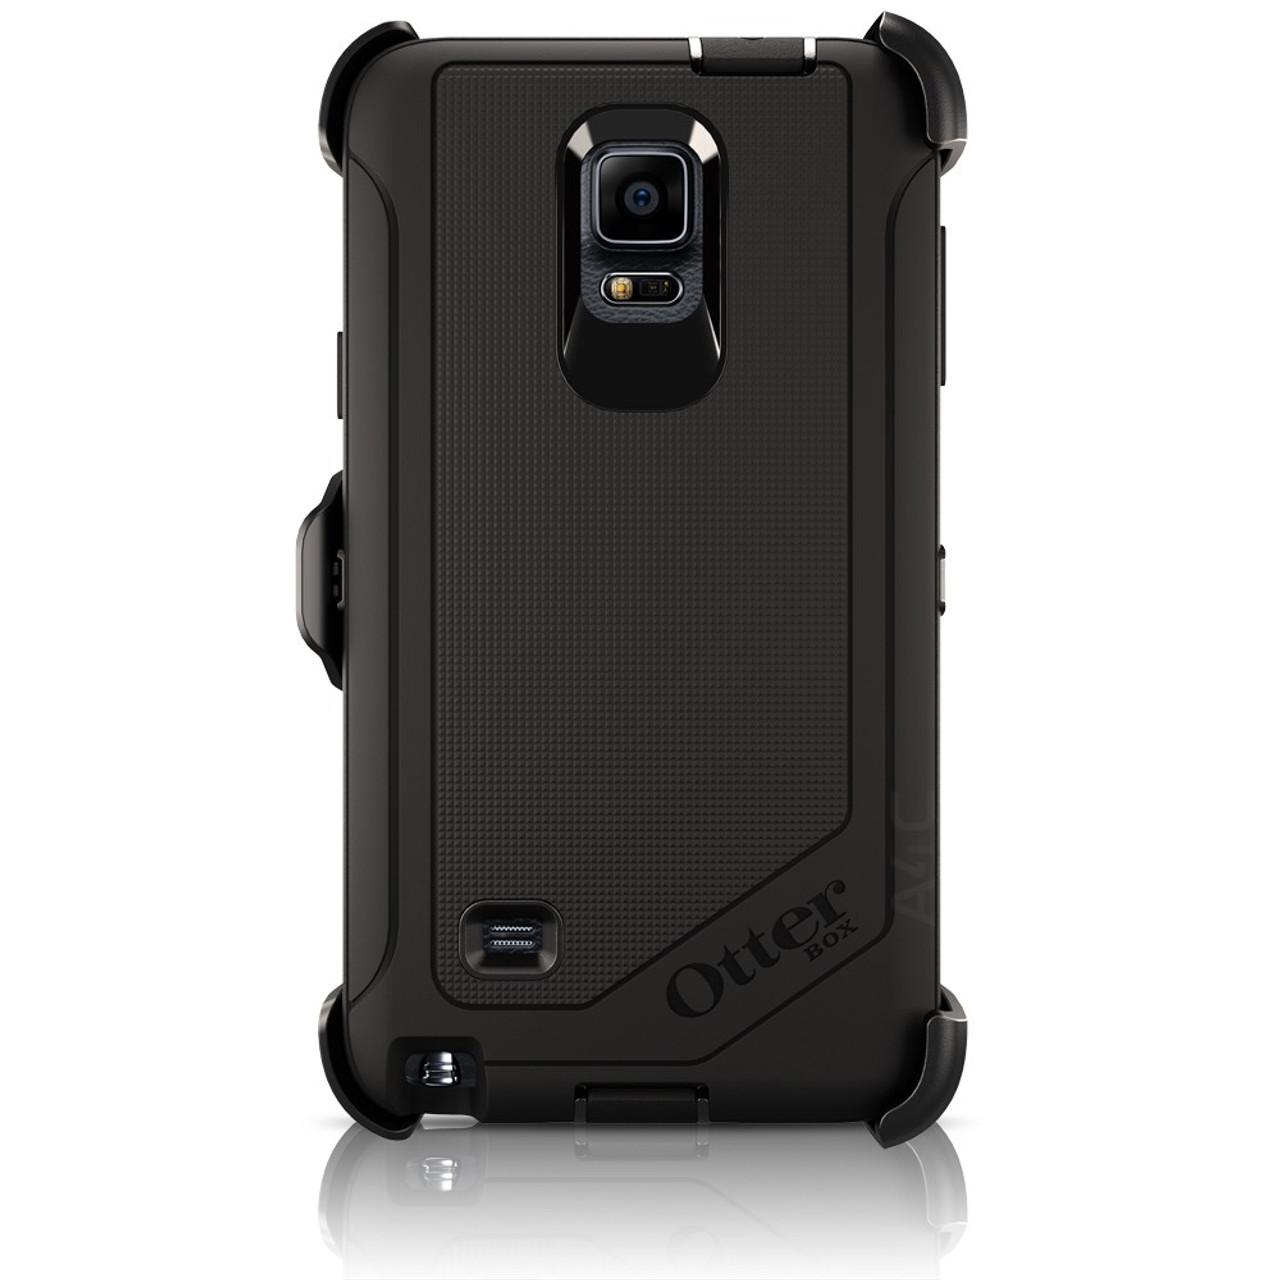 info for 9b69b 329f7 OtterBox Samsung Galaxy Note 4 Defender Case